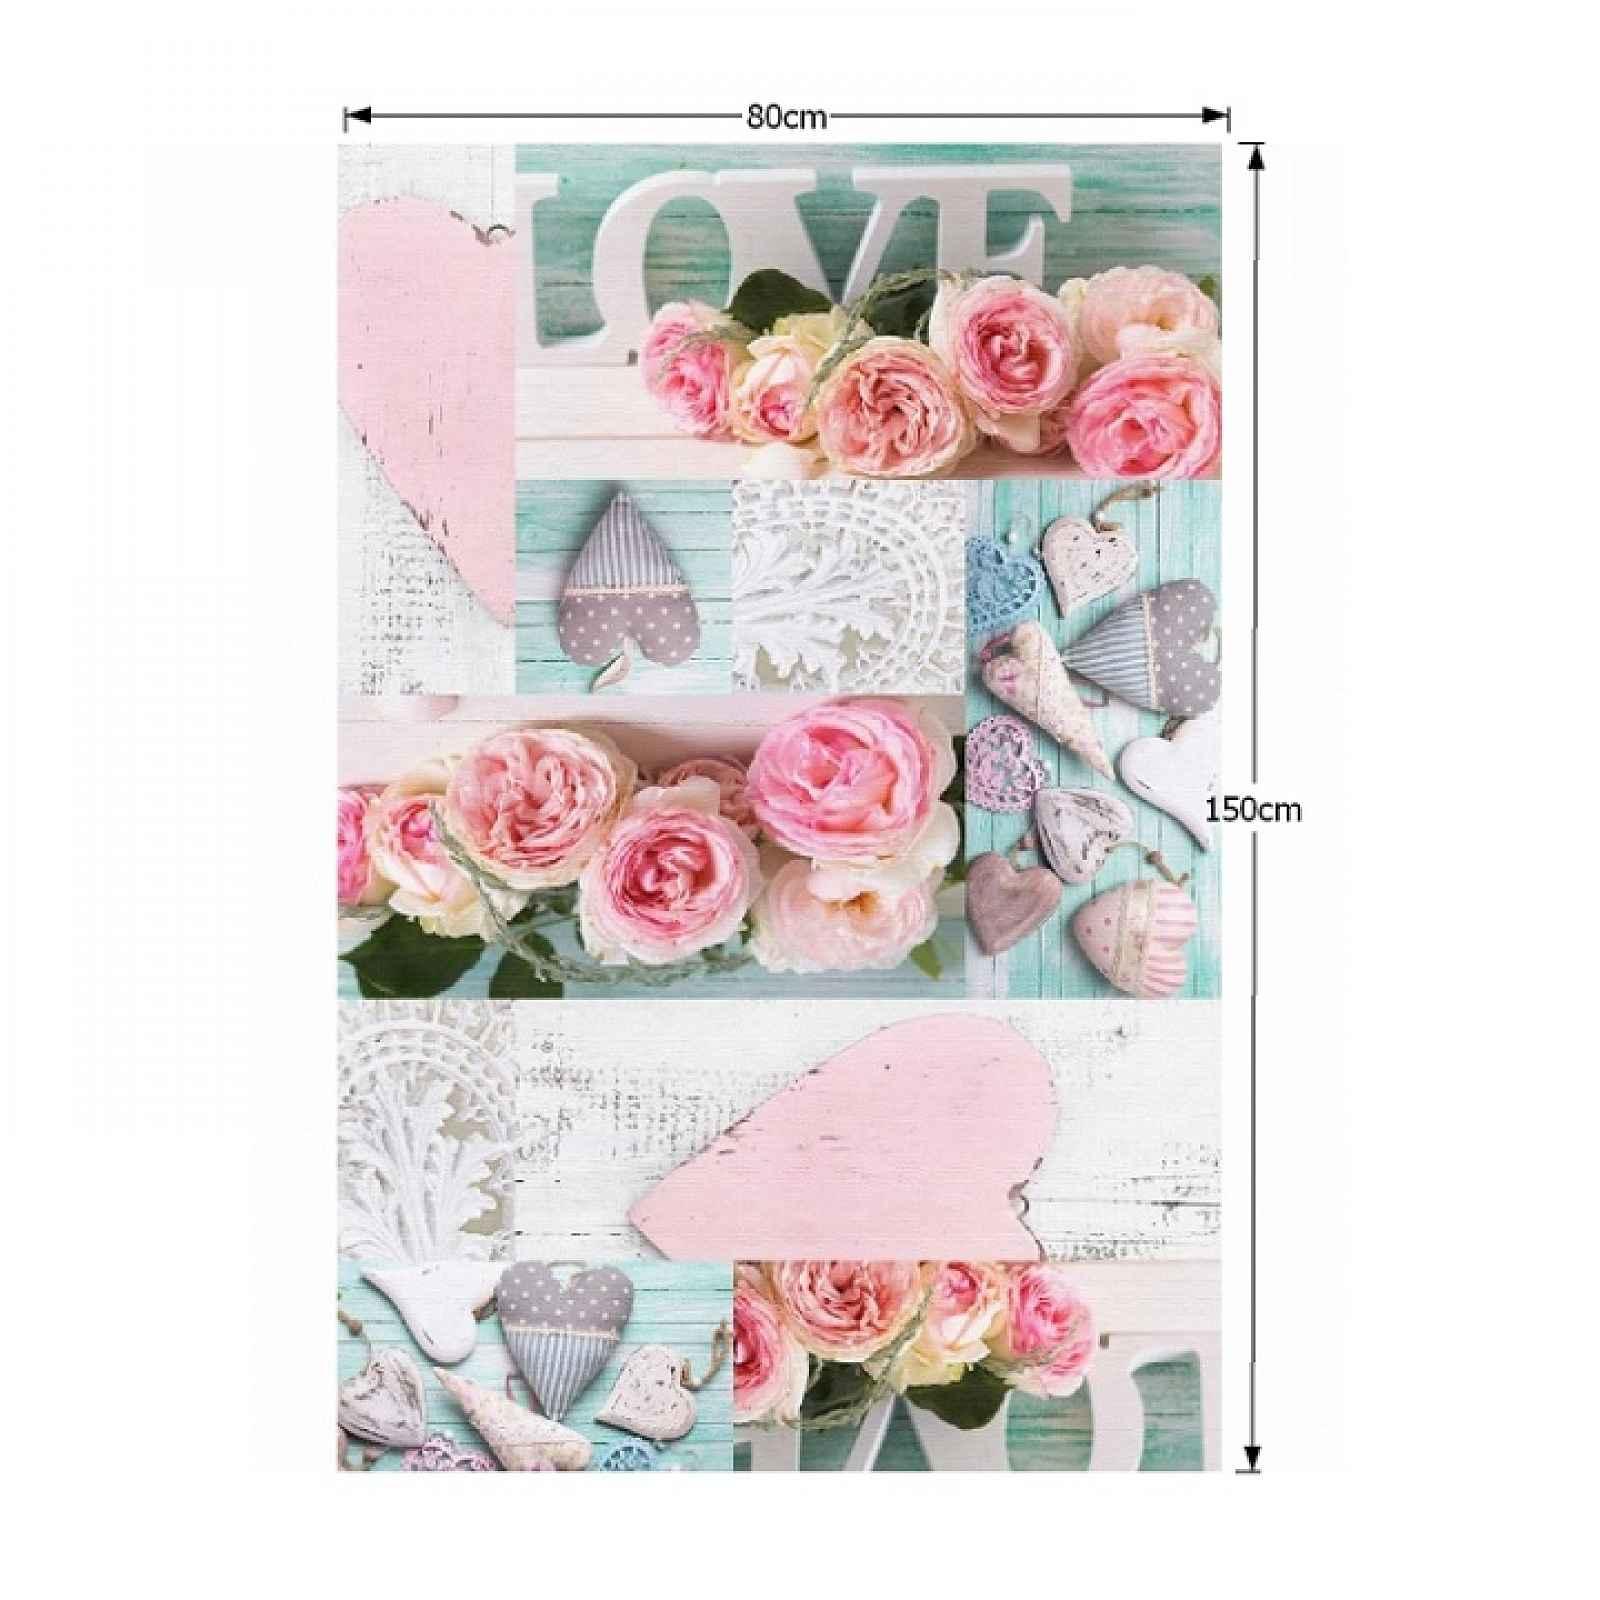 Koberec s třásněmi SONIL TYP 2 vzor růže Tempo Kondela 80x150 cm